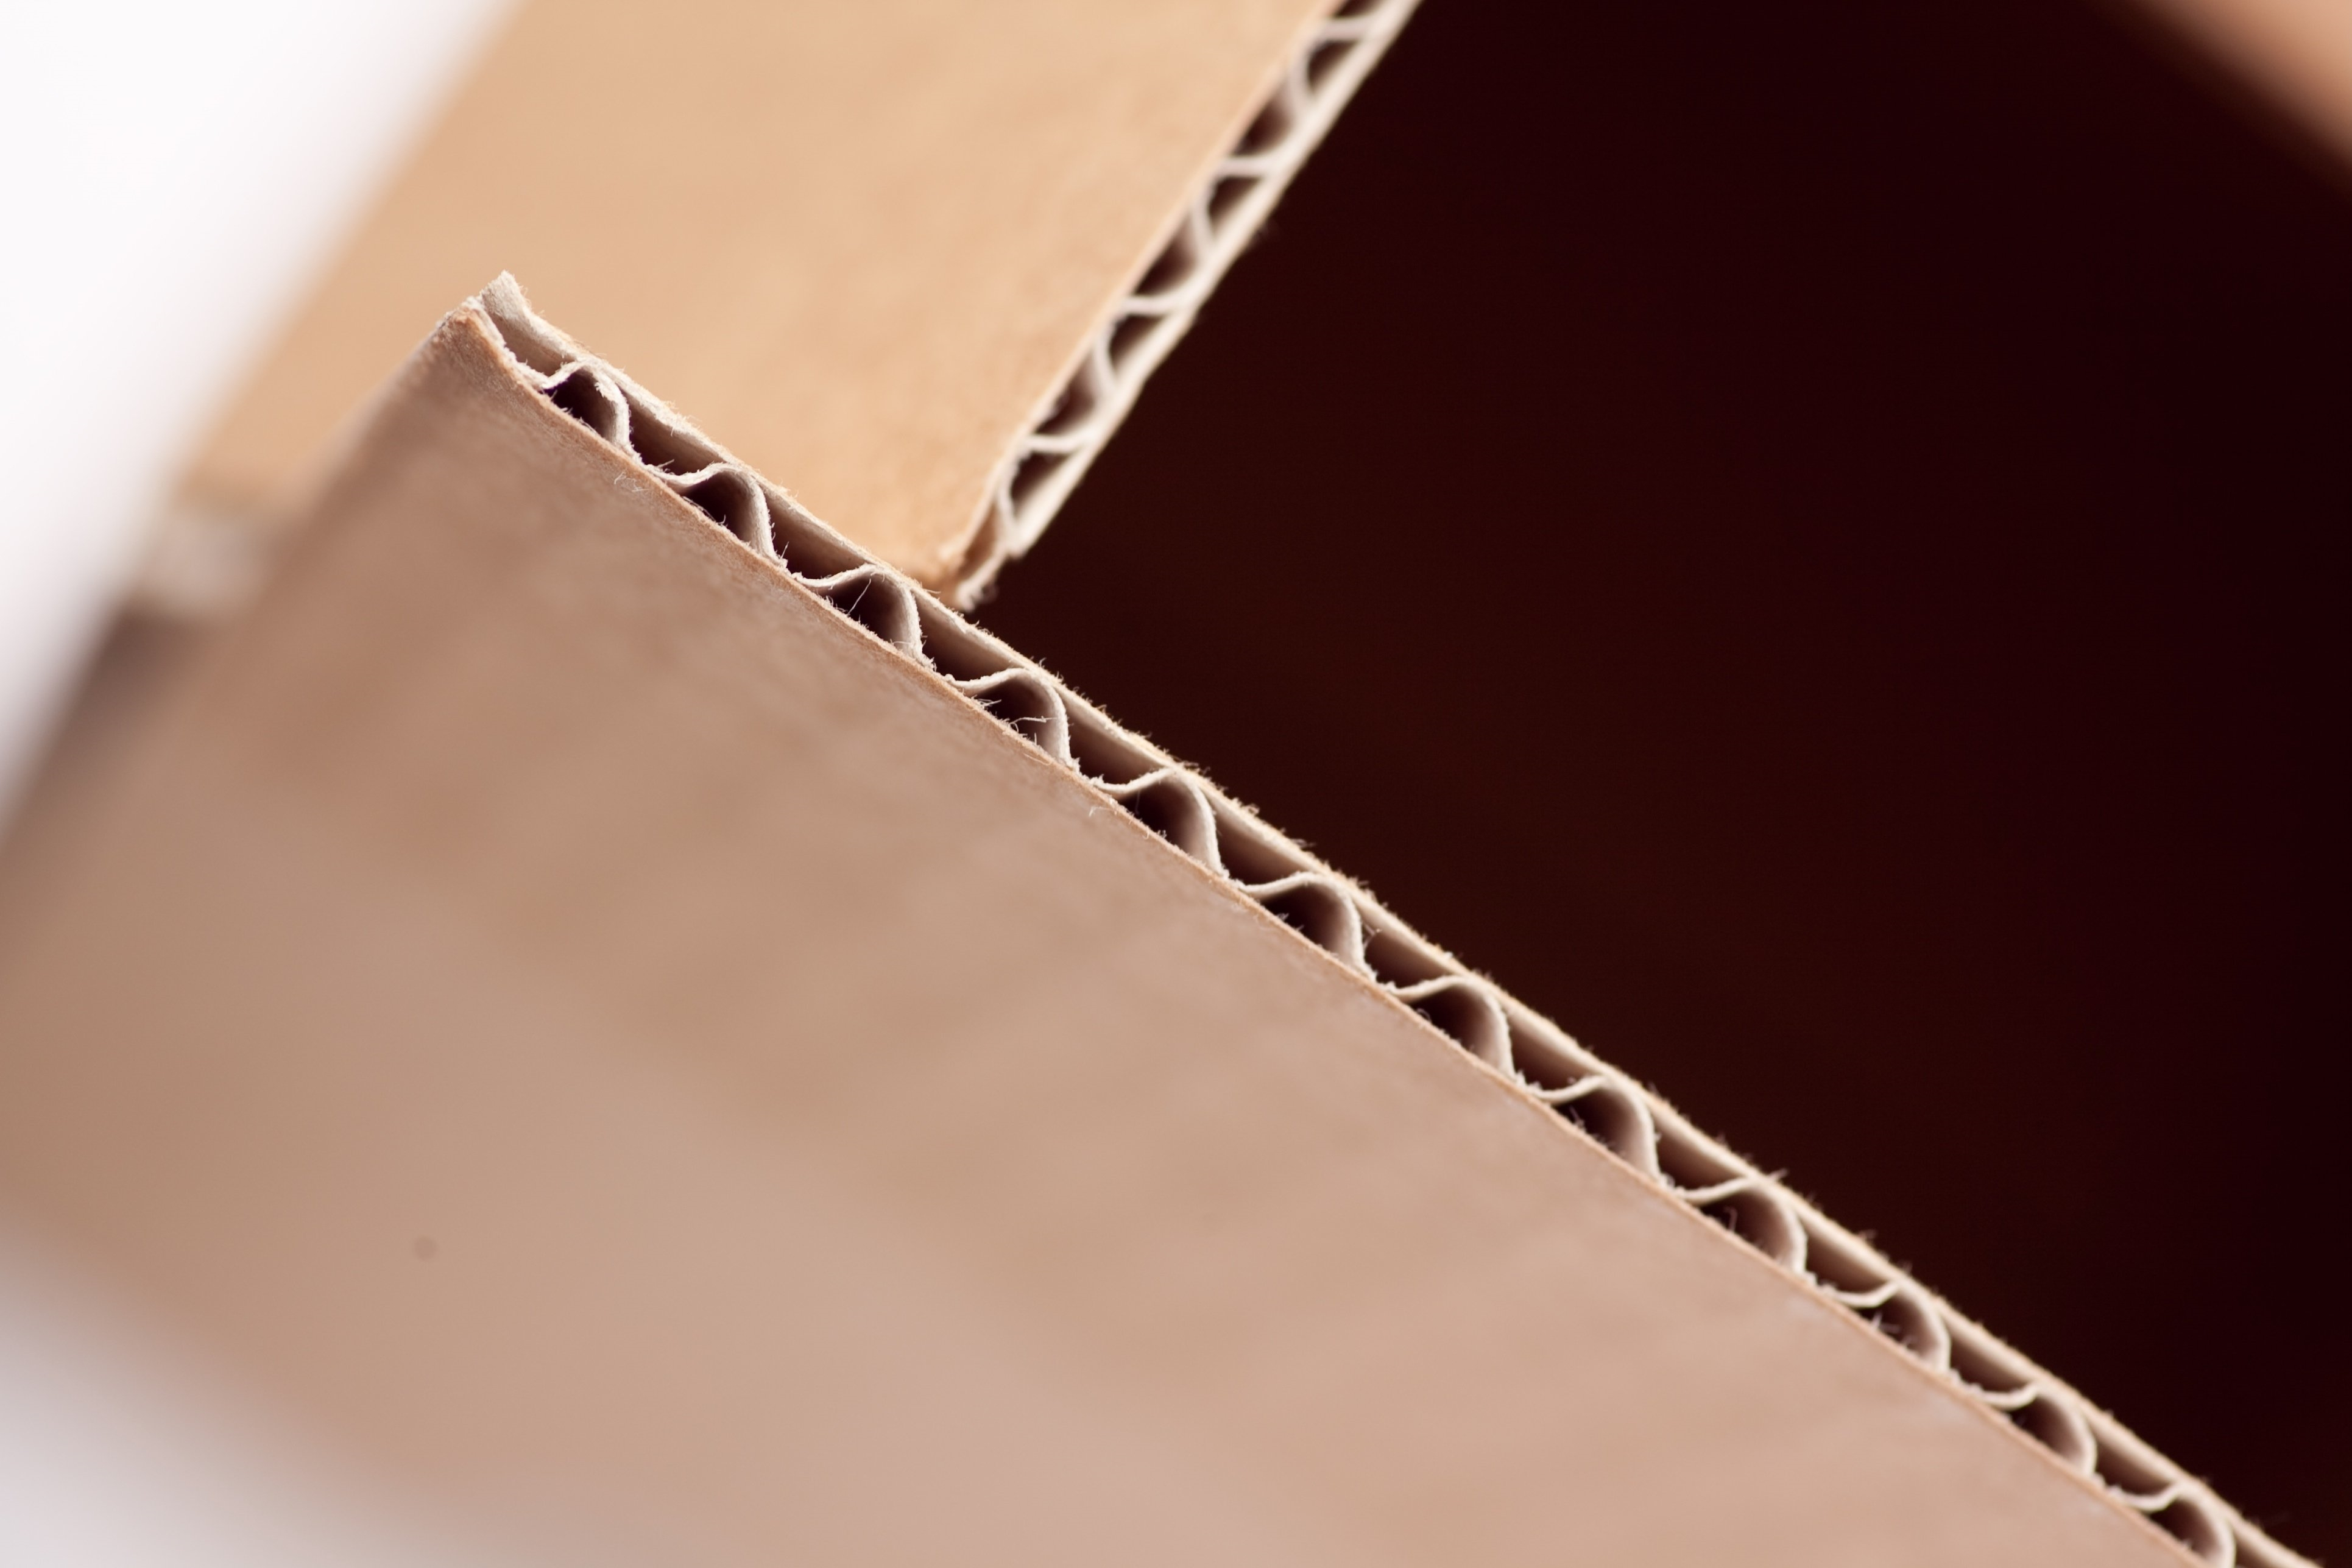 305 x 305 x 152mm Single Wall Cardboard Boxes - 4